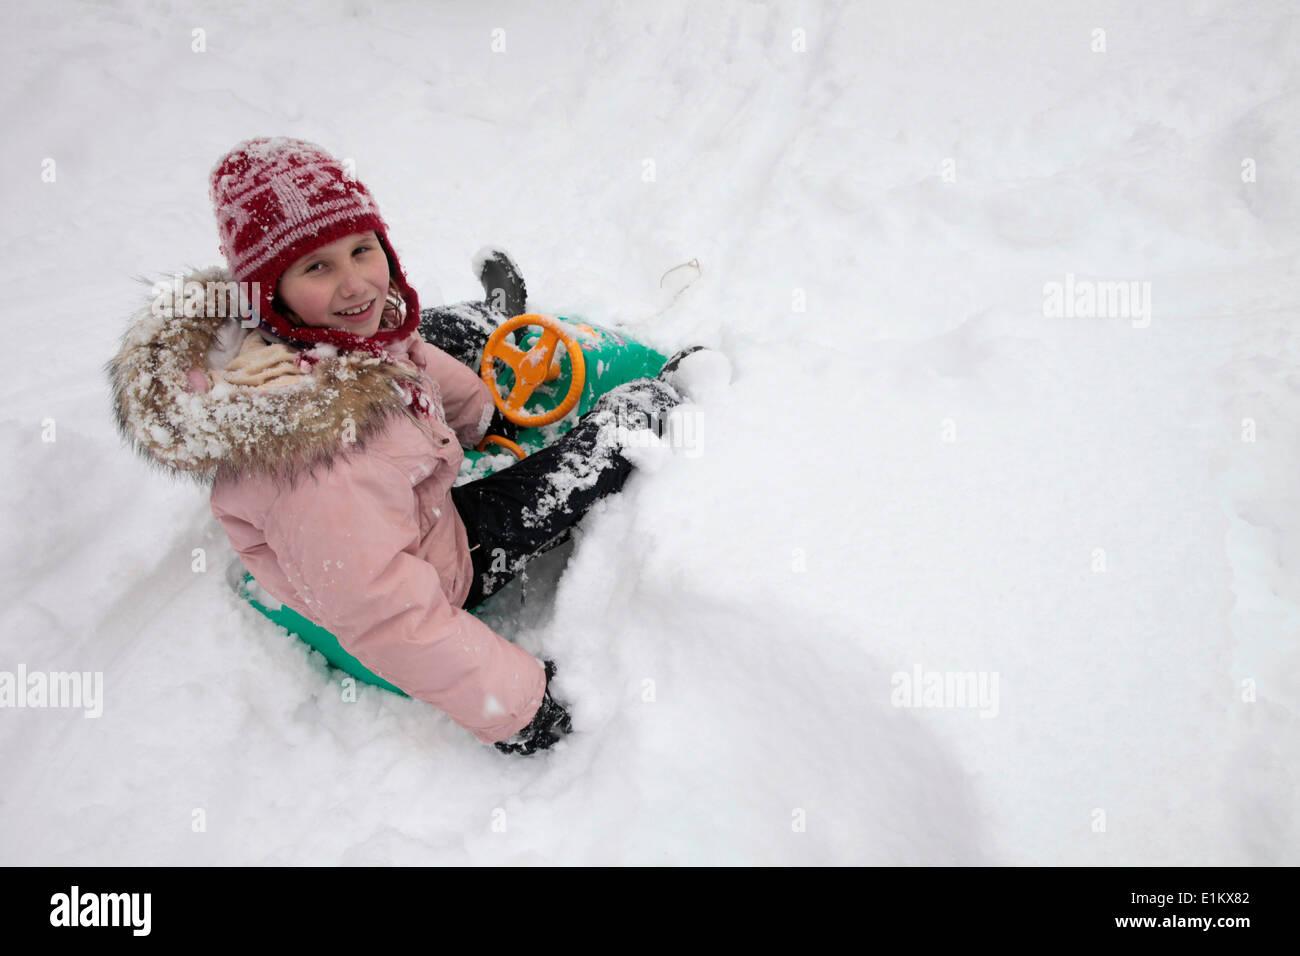 Girl on a sleigh - Stock Image